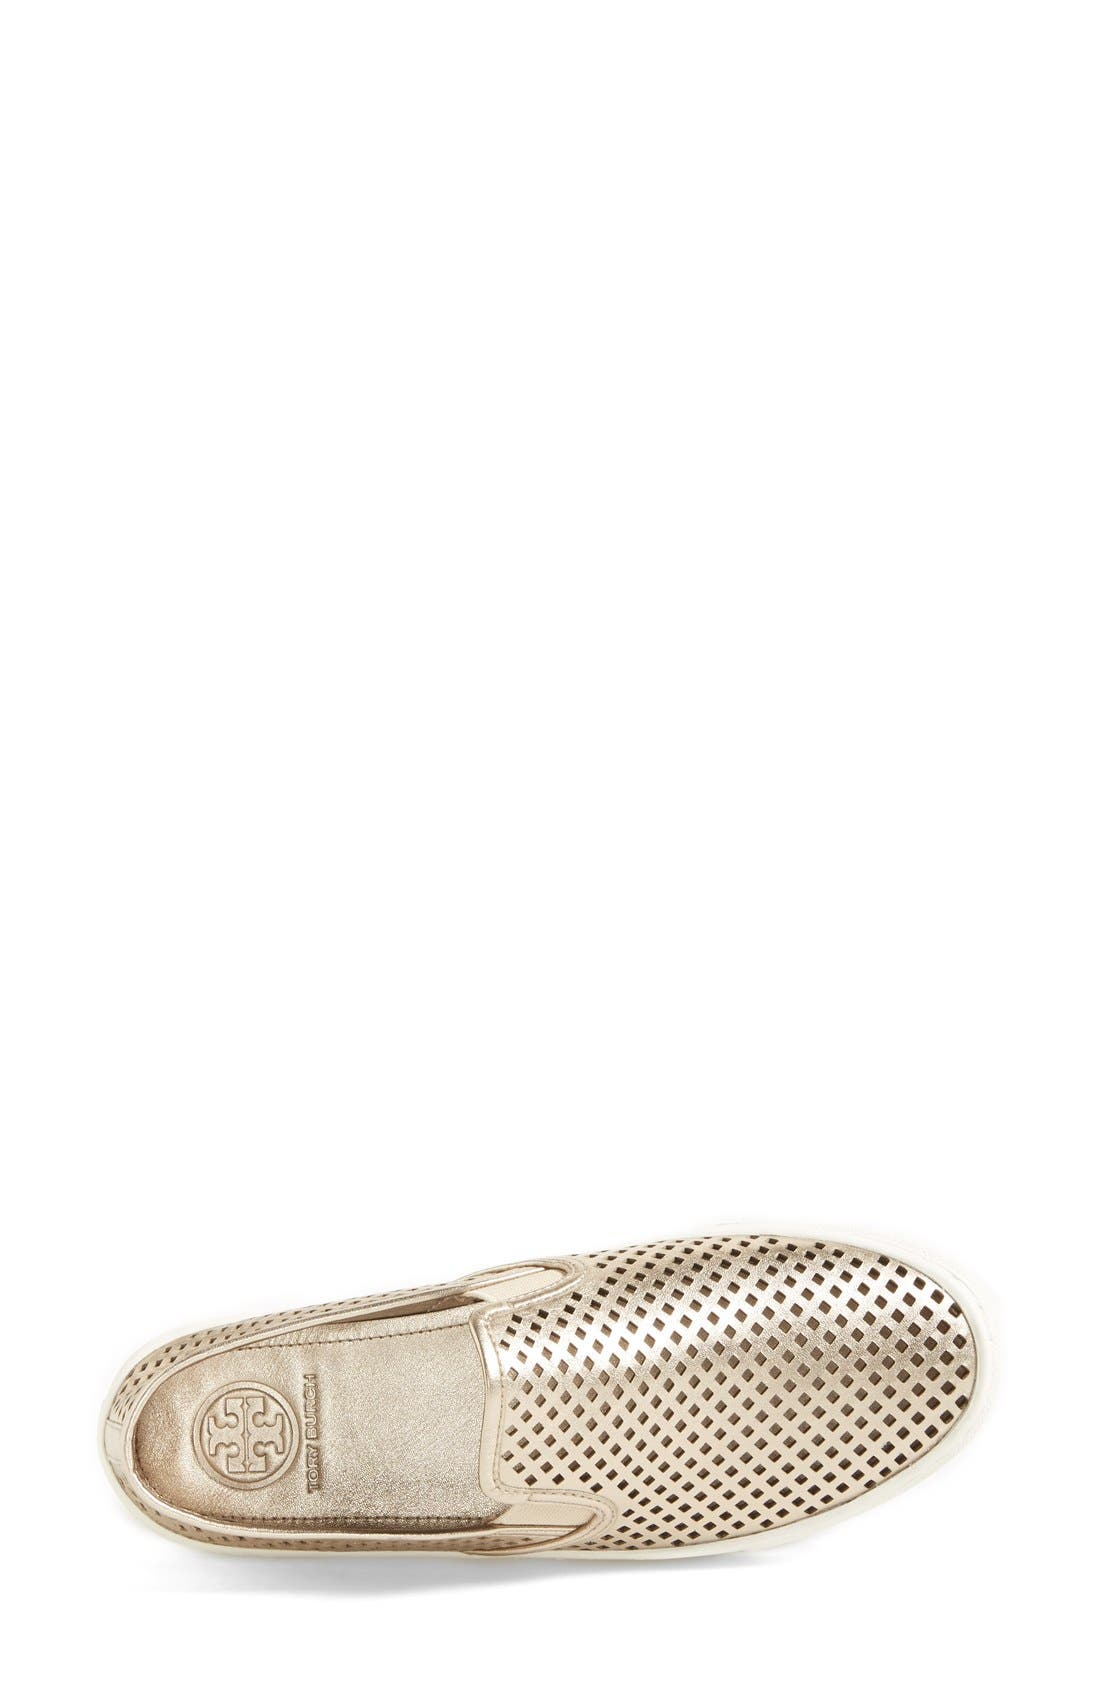 Alternate Image 3  - Tory Burch 'Jesse' Perforated Sneaker (Women)